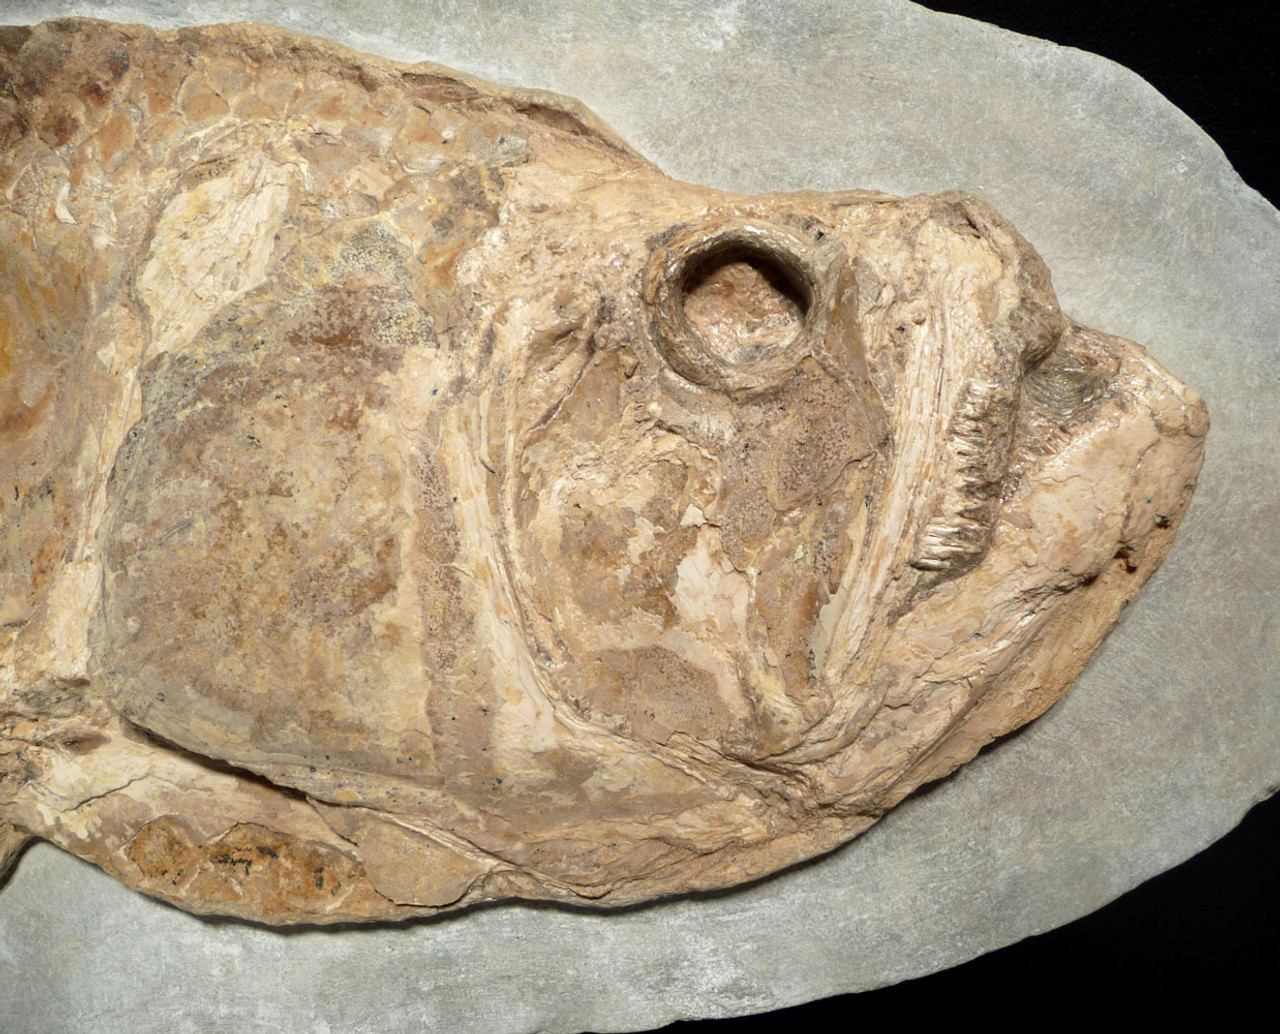 FINEST DINOSAUR-ERA GIANT PREHISTORIC TARPON-LIKE CLADOCYCLUS FISH FOSSIL  *FBR007